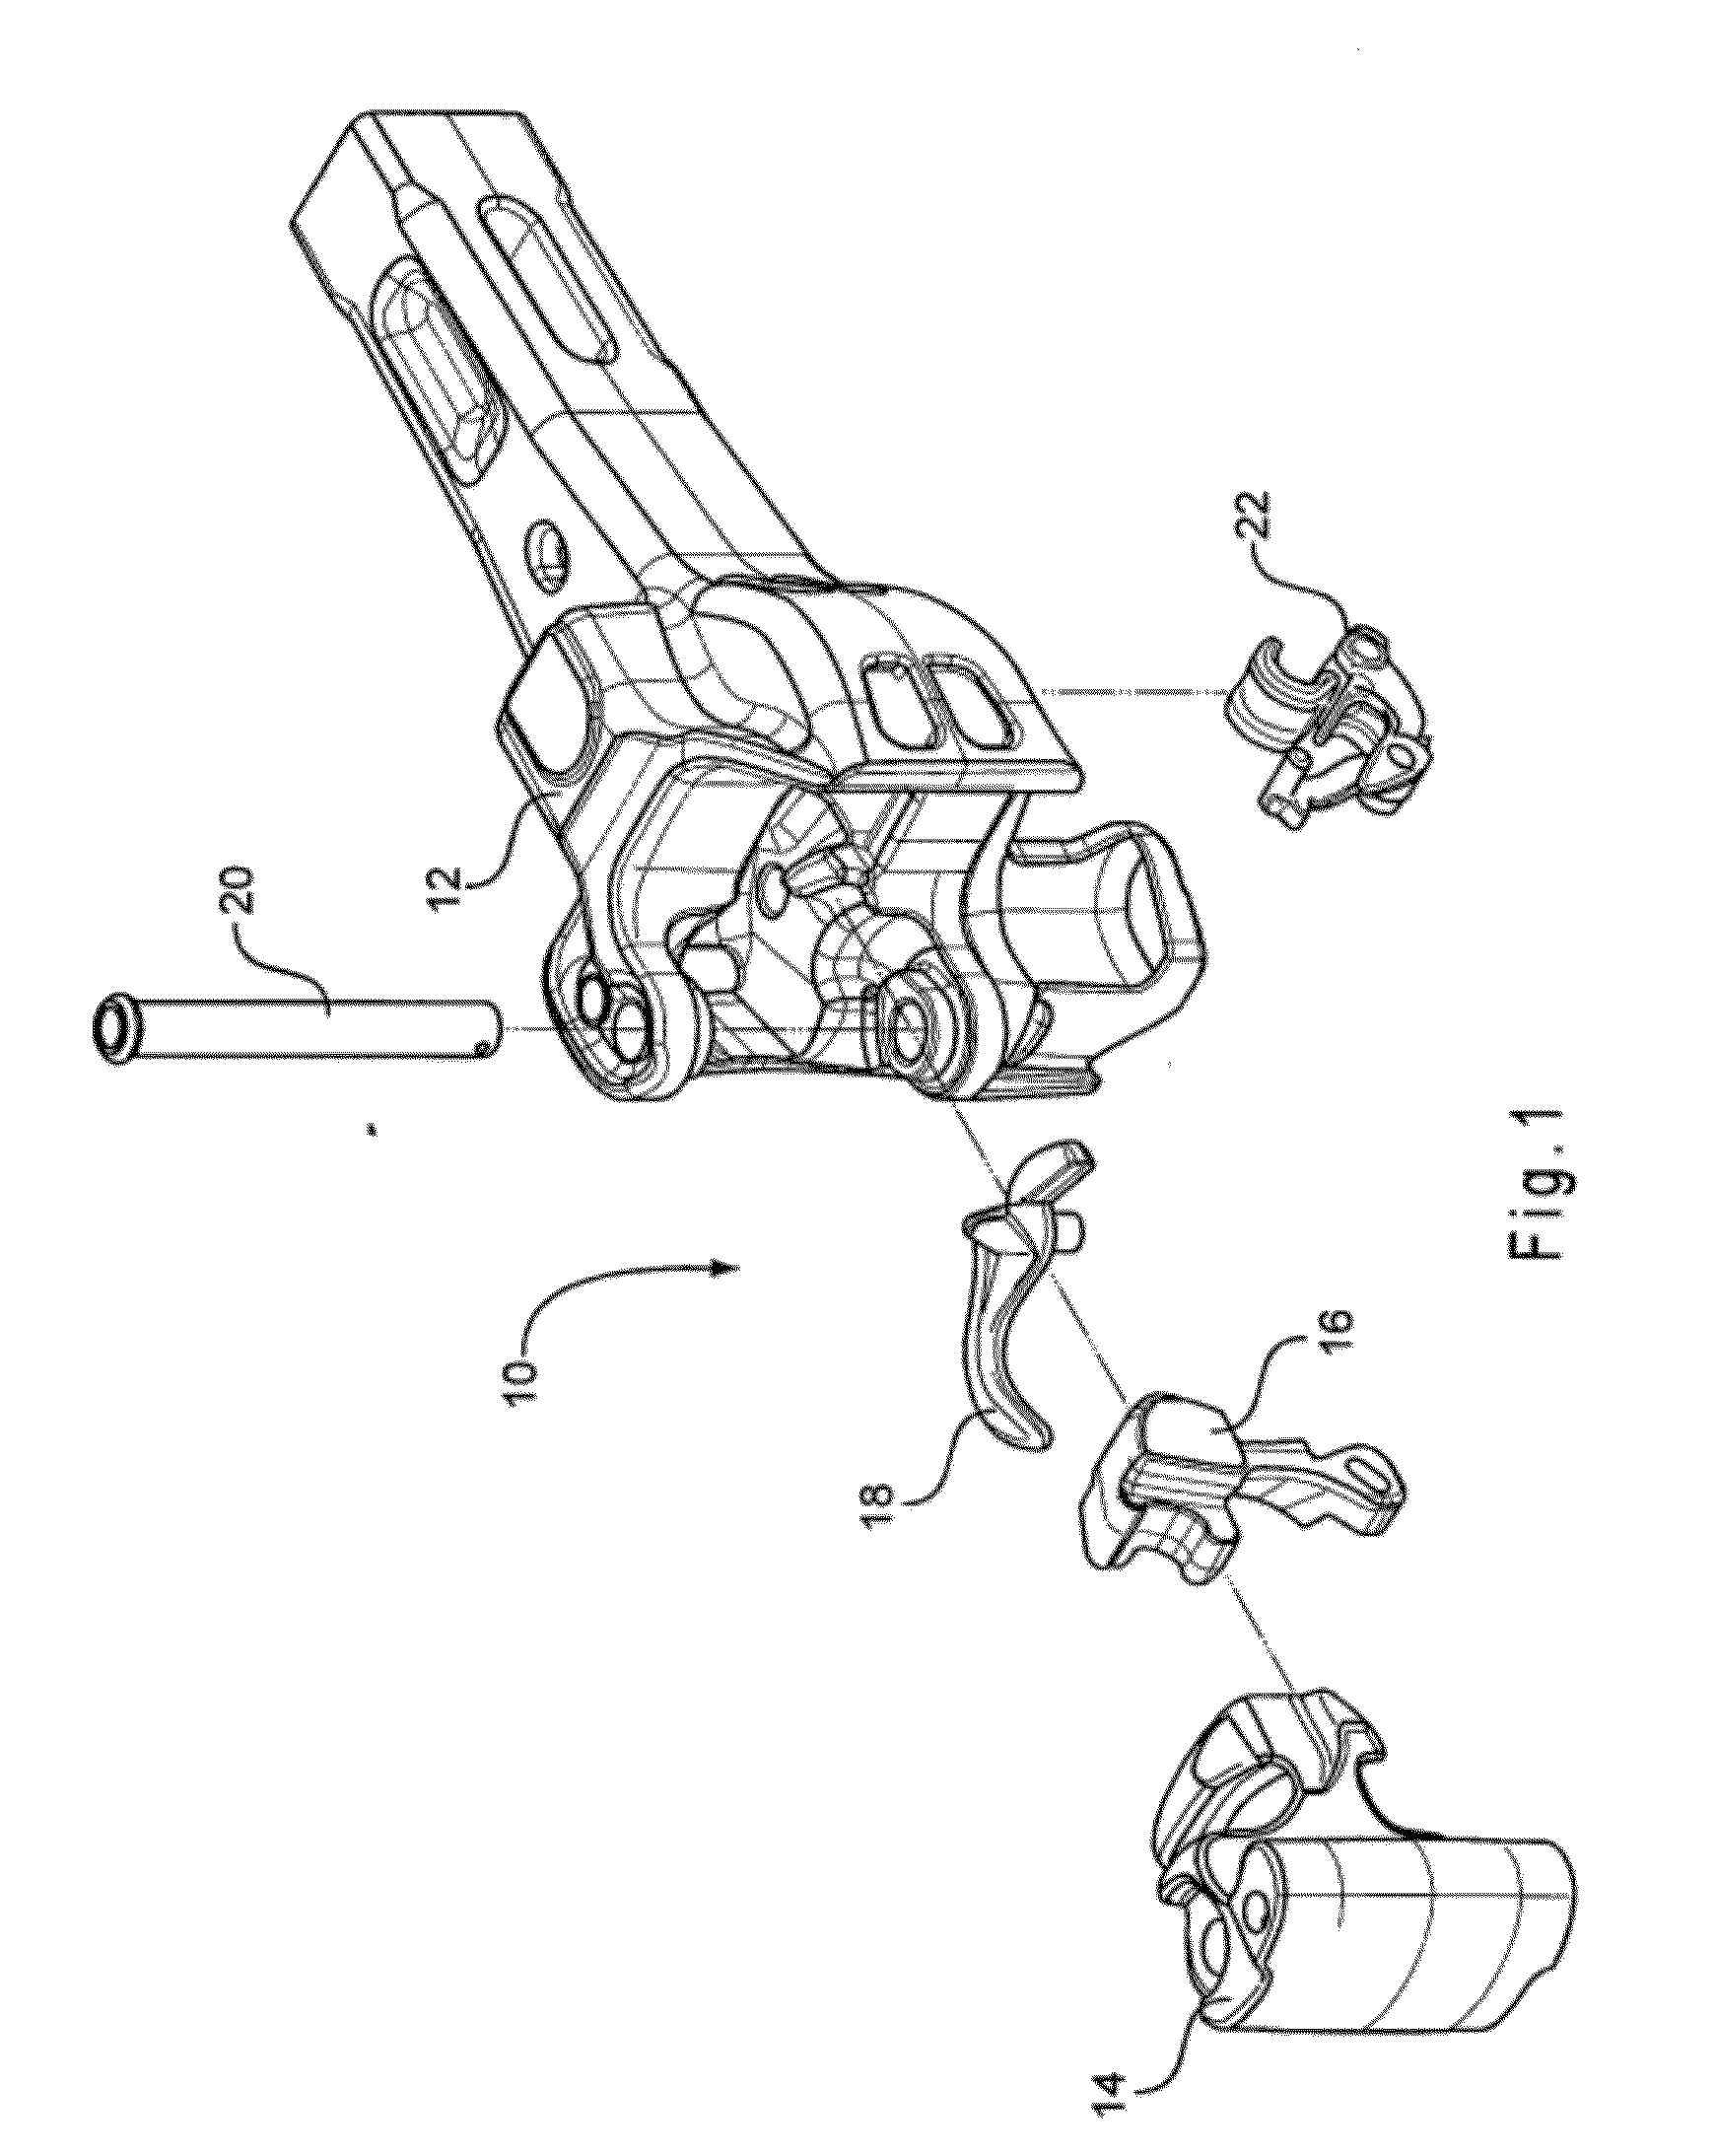 dcc pm42 wiring diagram